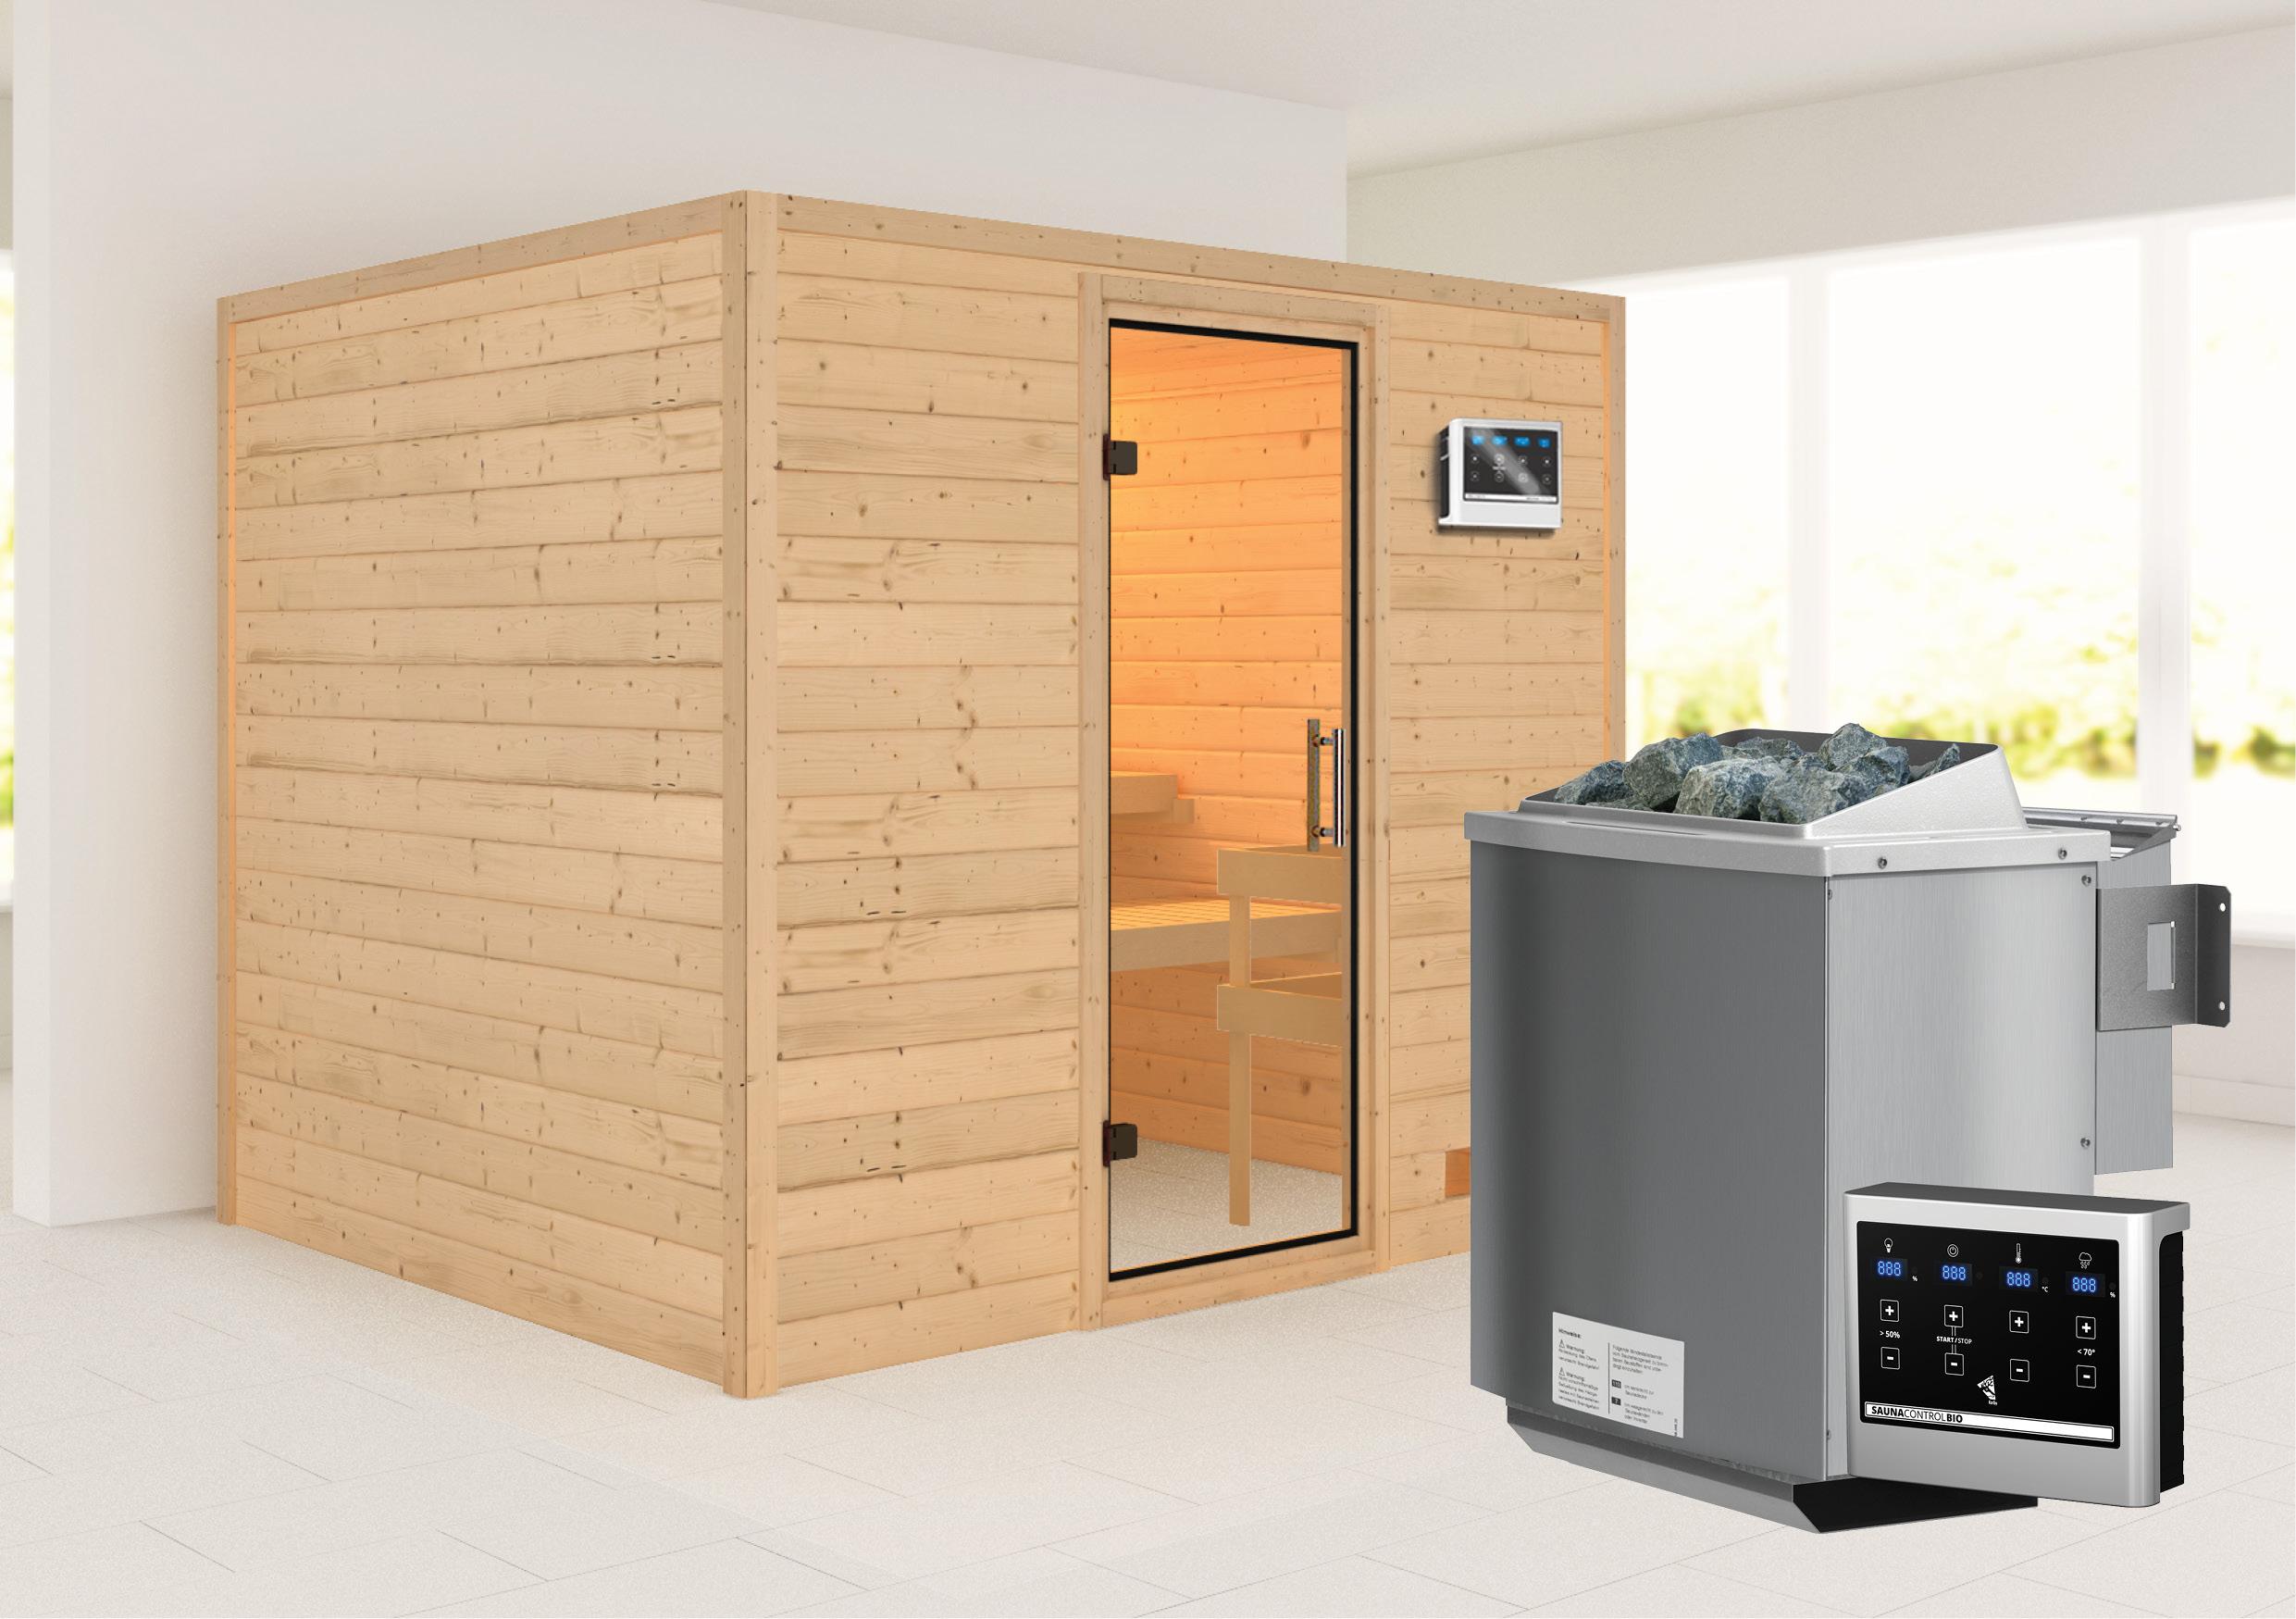 Woodfeeling Sauna Karla 38mm Ofen Bio 9kW Tür Klarglas Bild 1